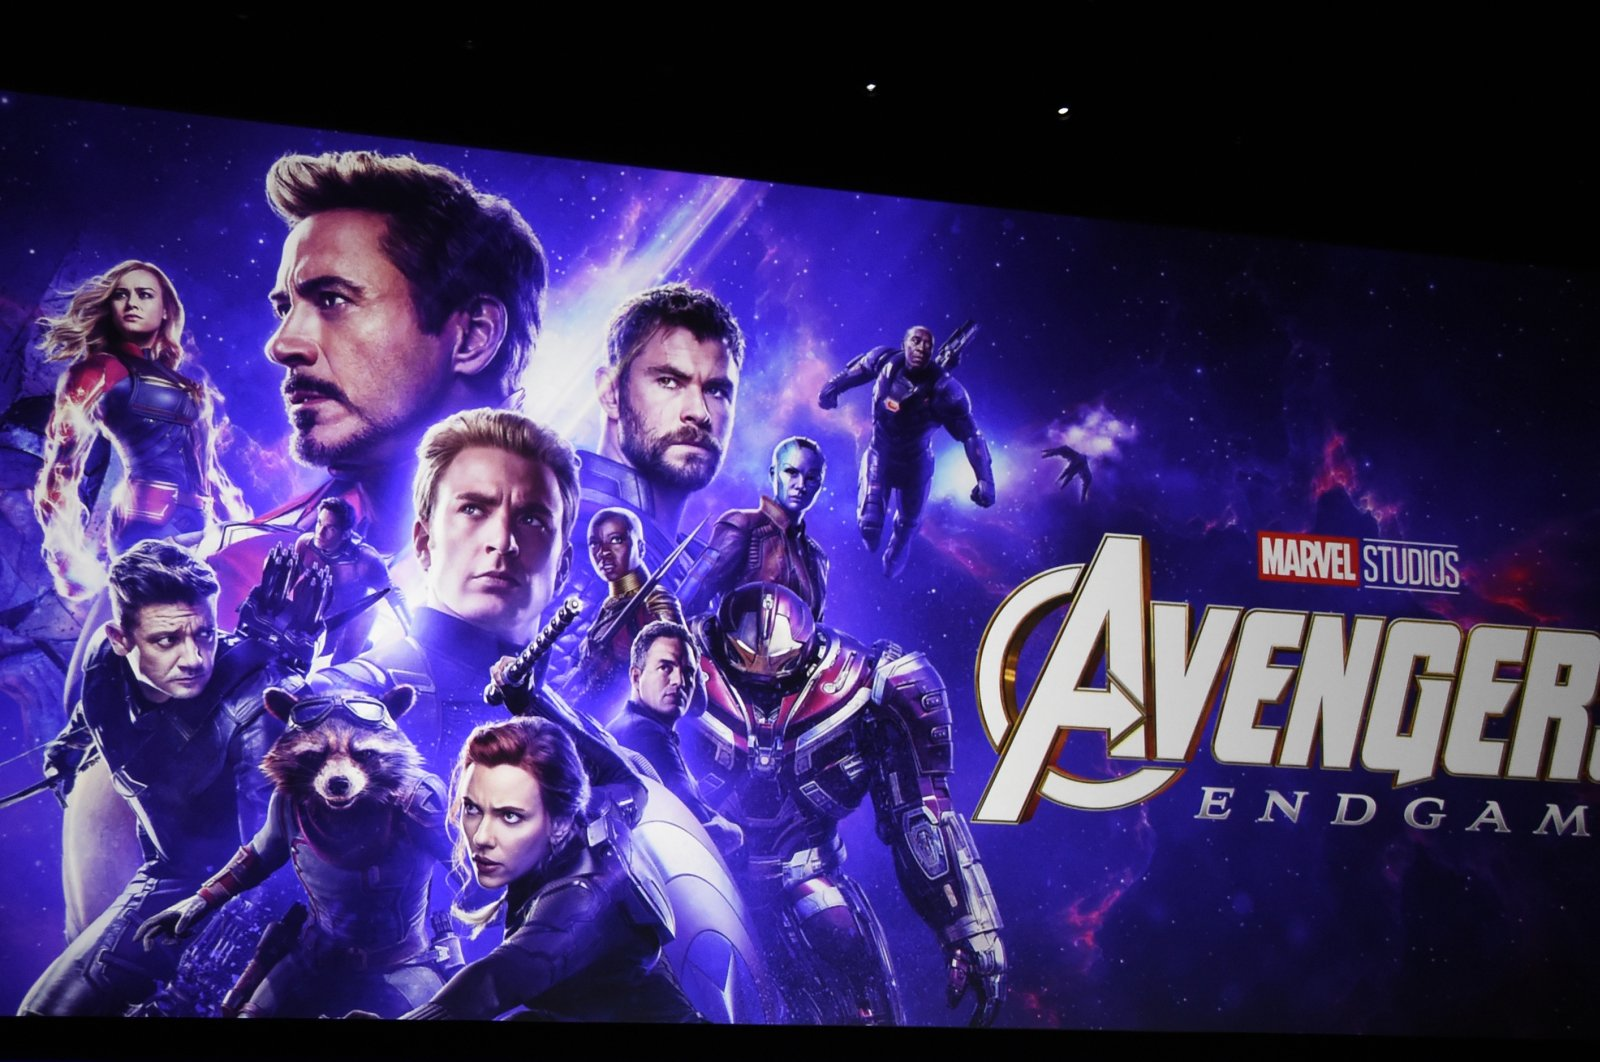 "Artwork for the Marvel Studios film ""Avengers: Endgame"" appears on stage during the Walt Disney Studios Motion Pictures presentation at CinemaCon in Las Vegas, U.S., April 3, 2019. (AP Photo)"